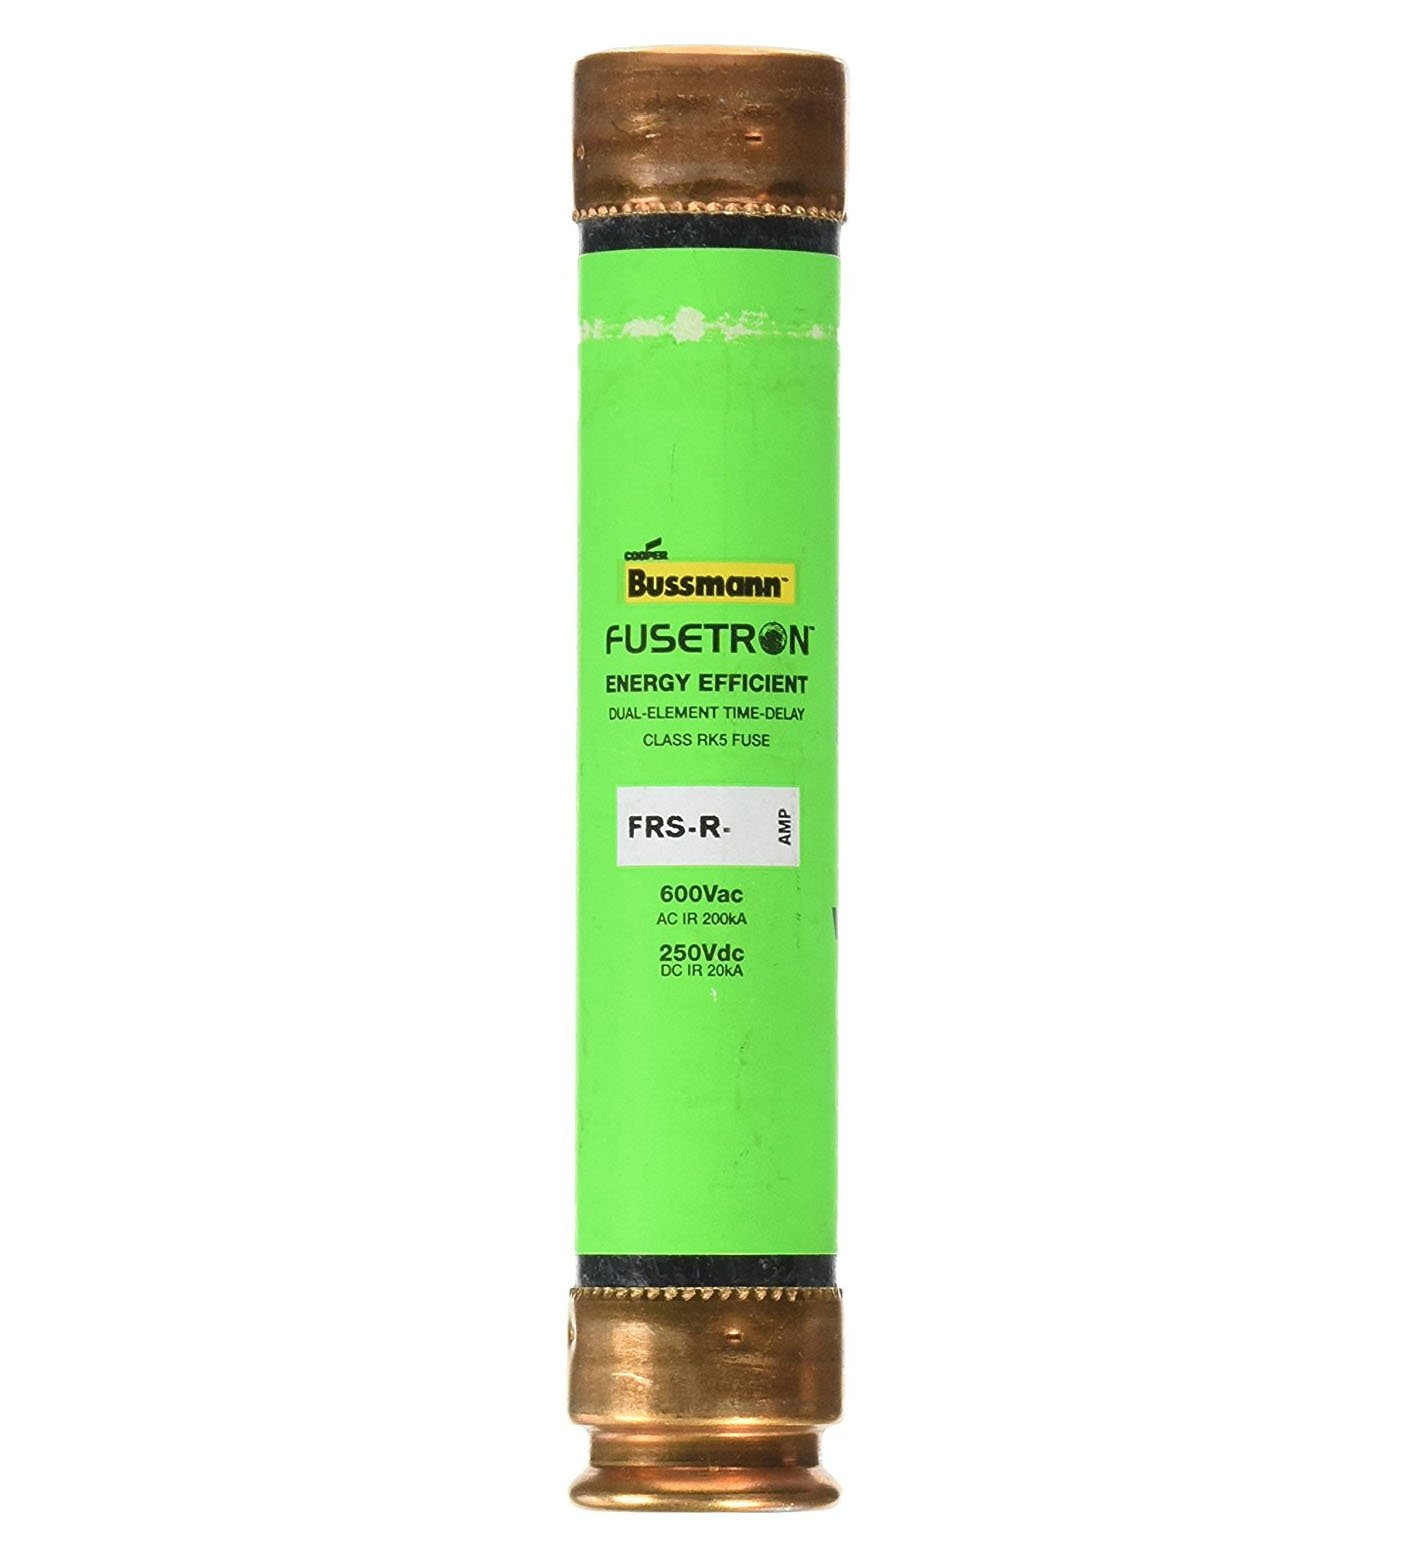 Bussmann FRS-R-60 Fusetron Dual Element Time-Delay Fuse 600V 60 Amp